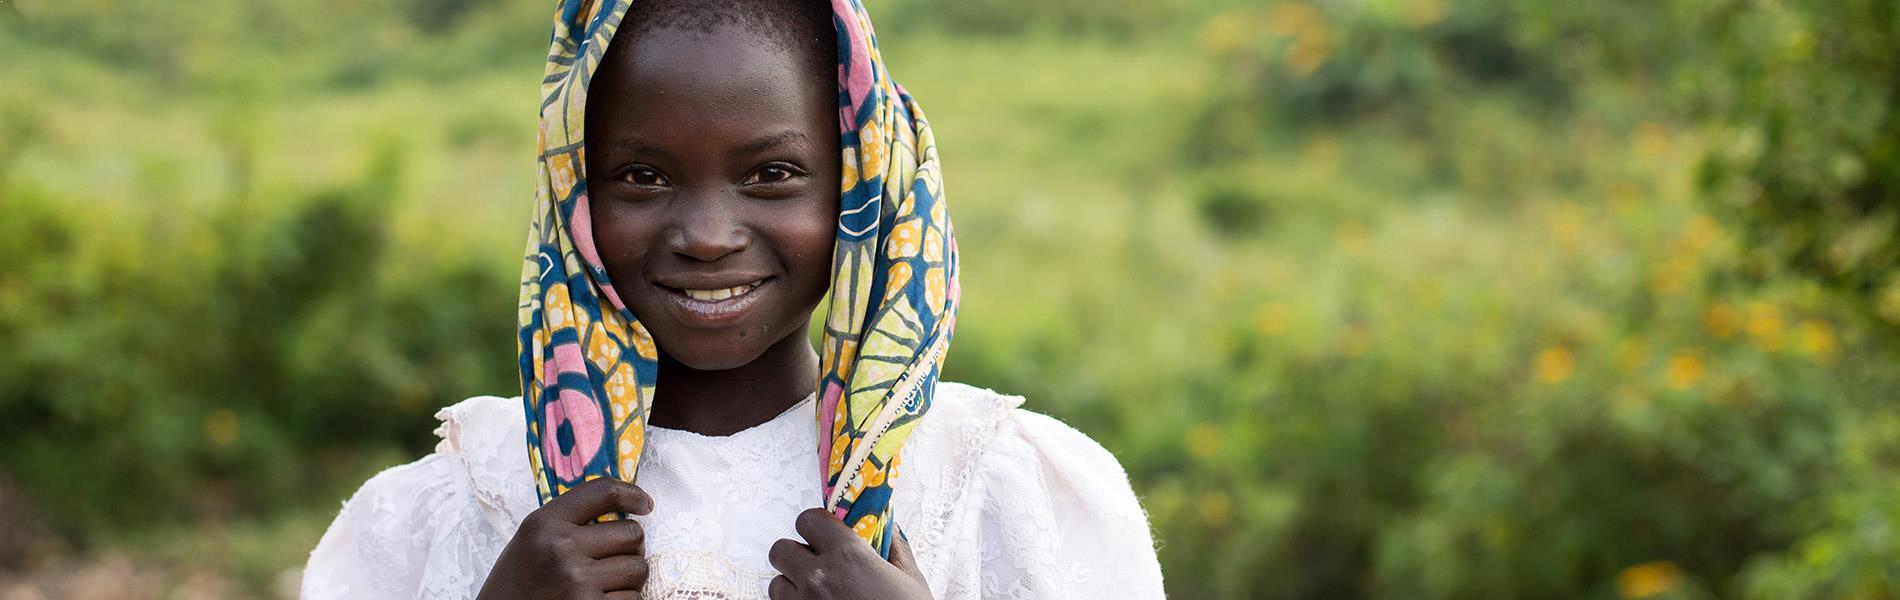 RDC petite fille foulard